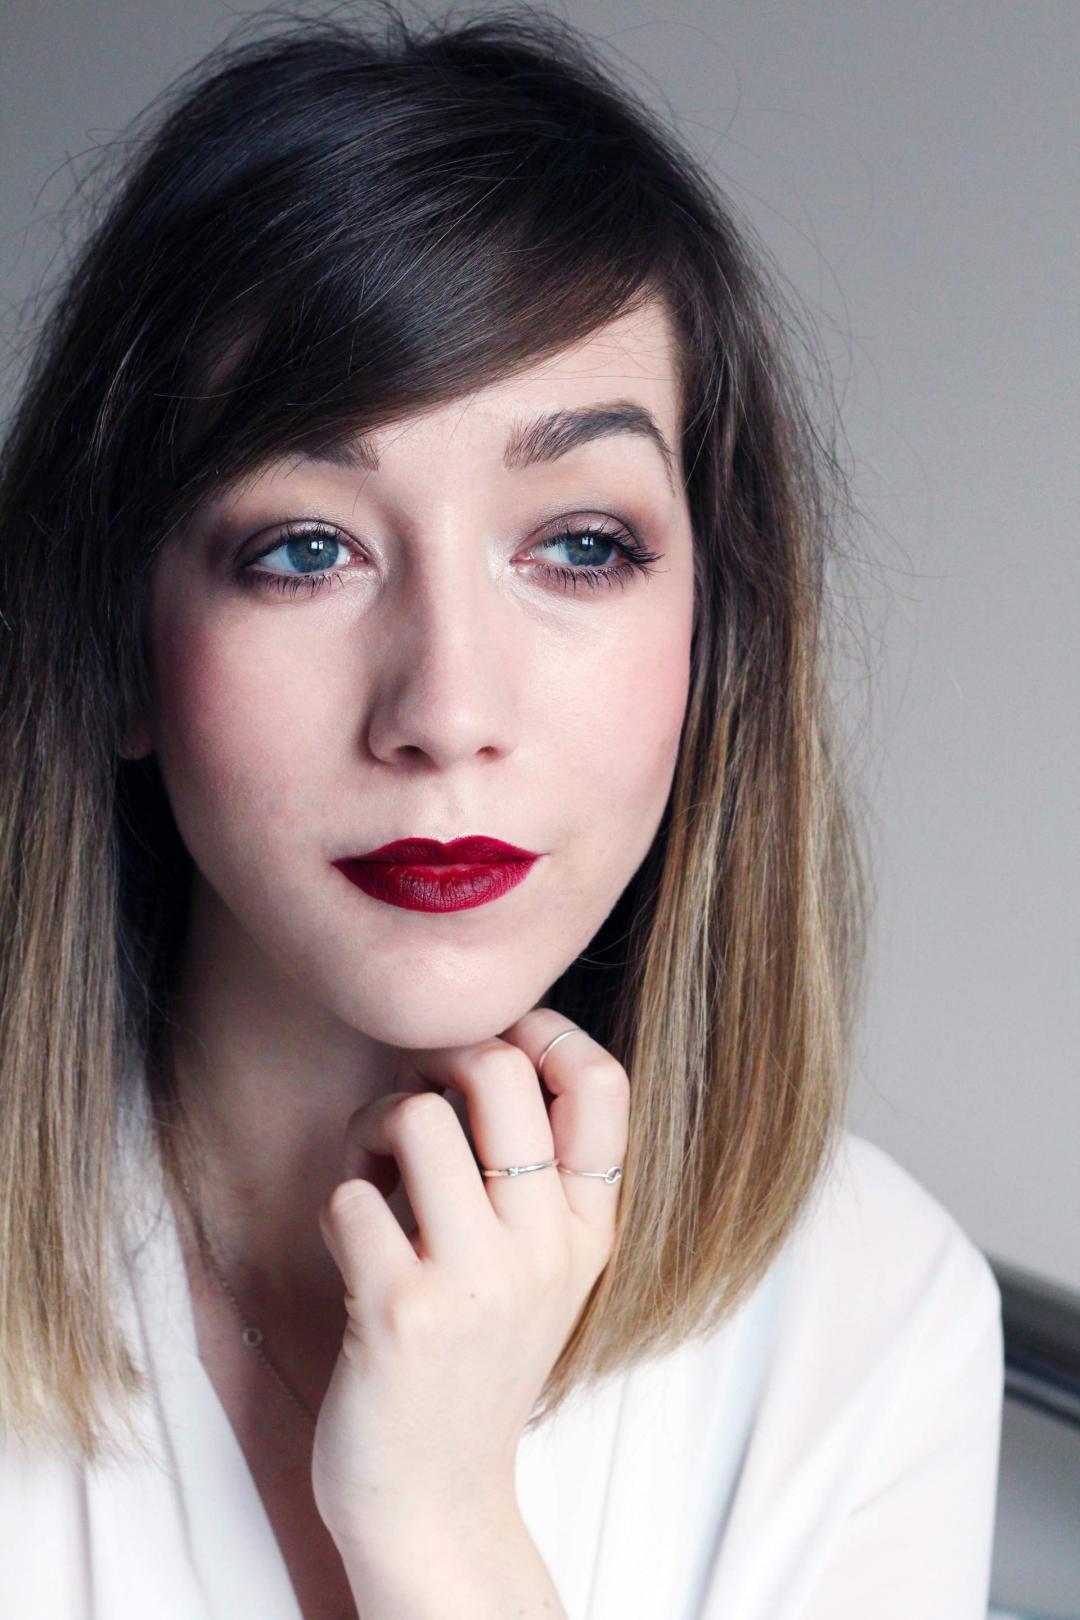 makeup-look-MAC-diva-lipstick-satin-taupe-eyeshadow-beauty-blogger